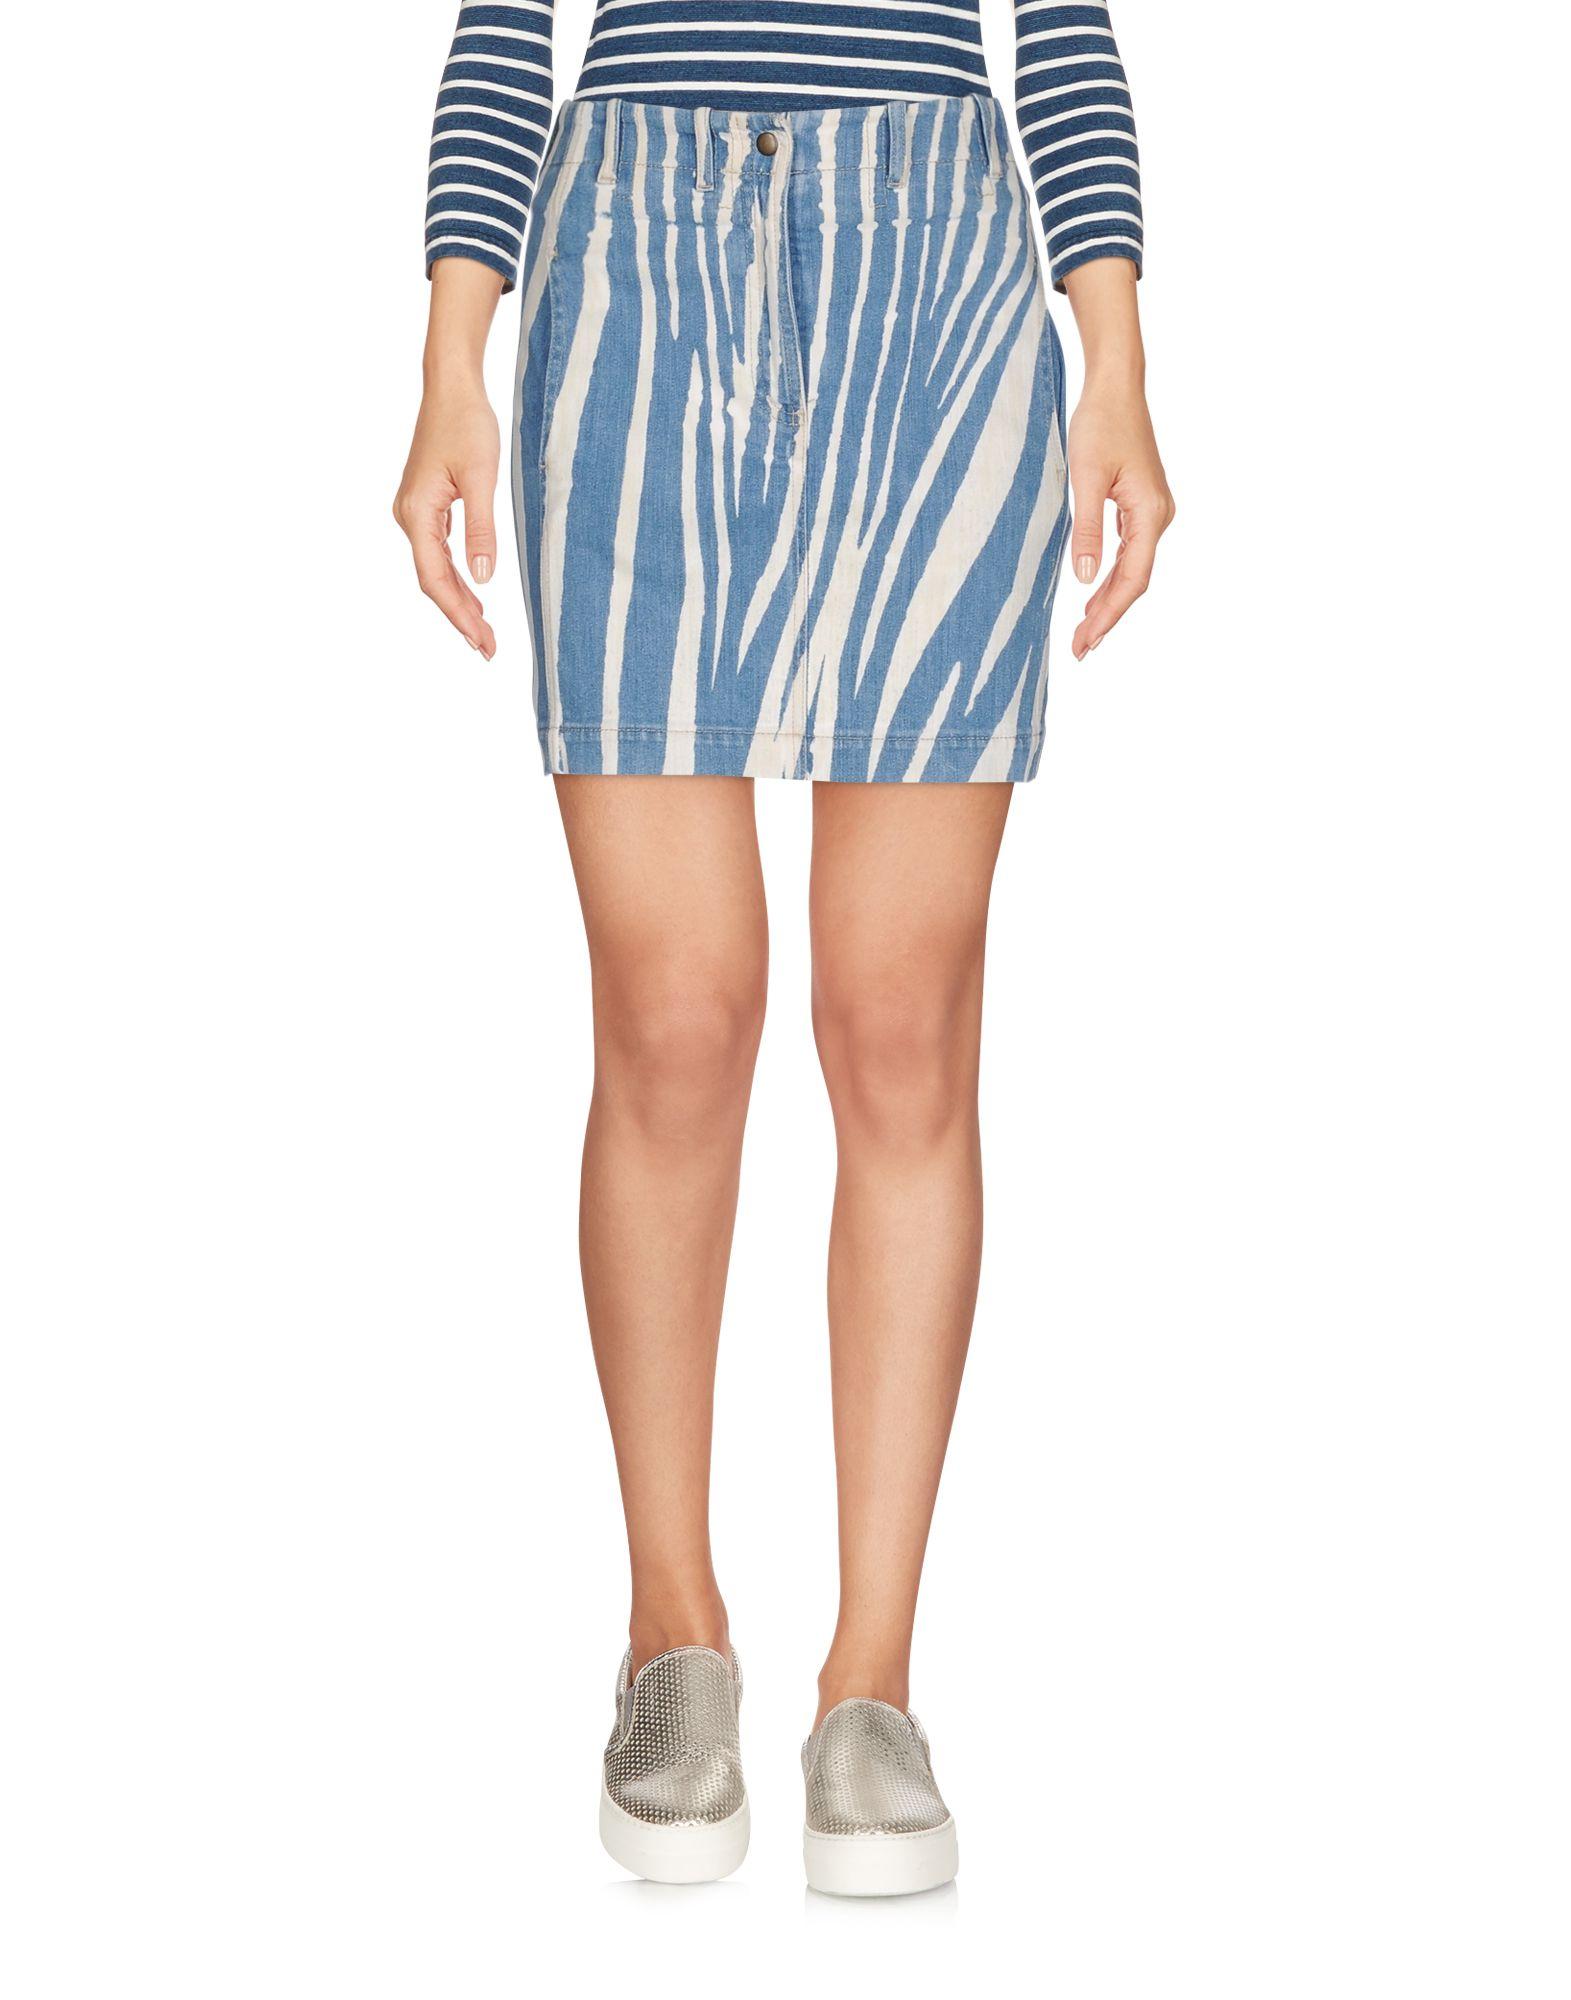 ROBERTO CAVALLI Джинсовая юбка юбка джинсовая marks